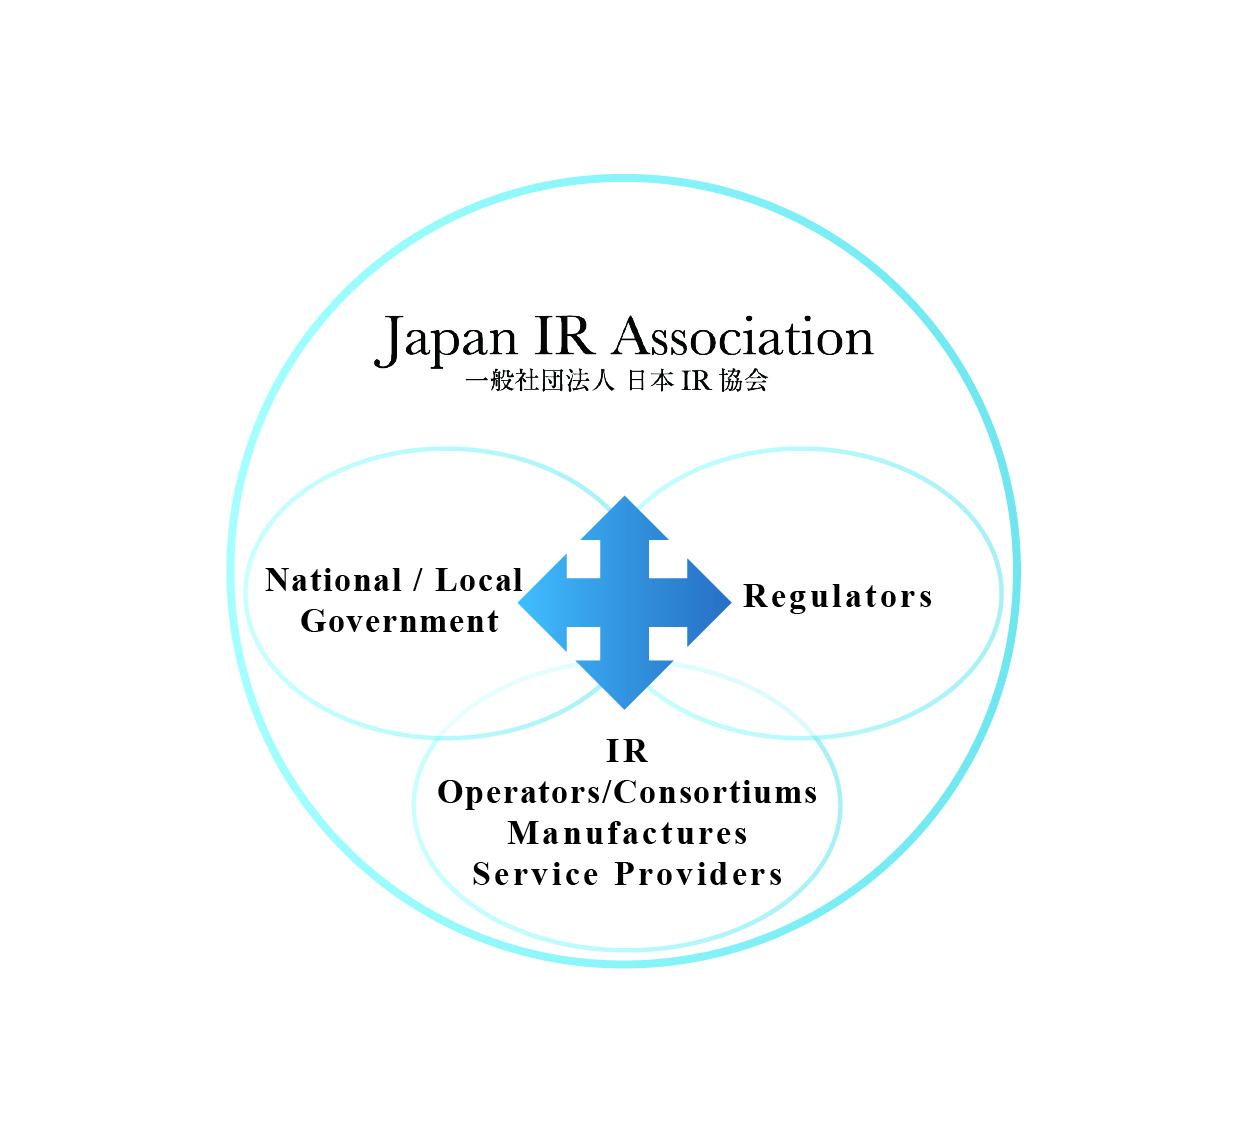 Japan IR Associationの理念